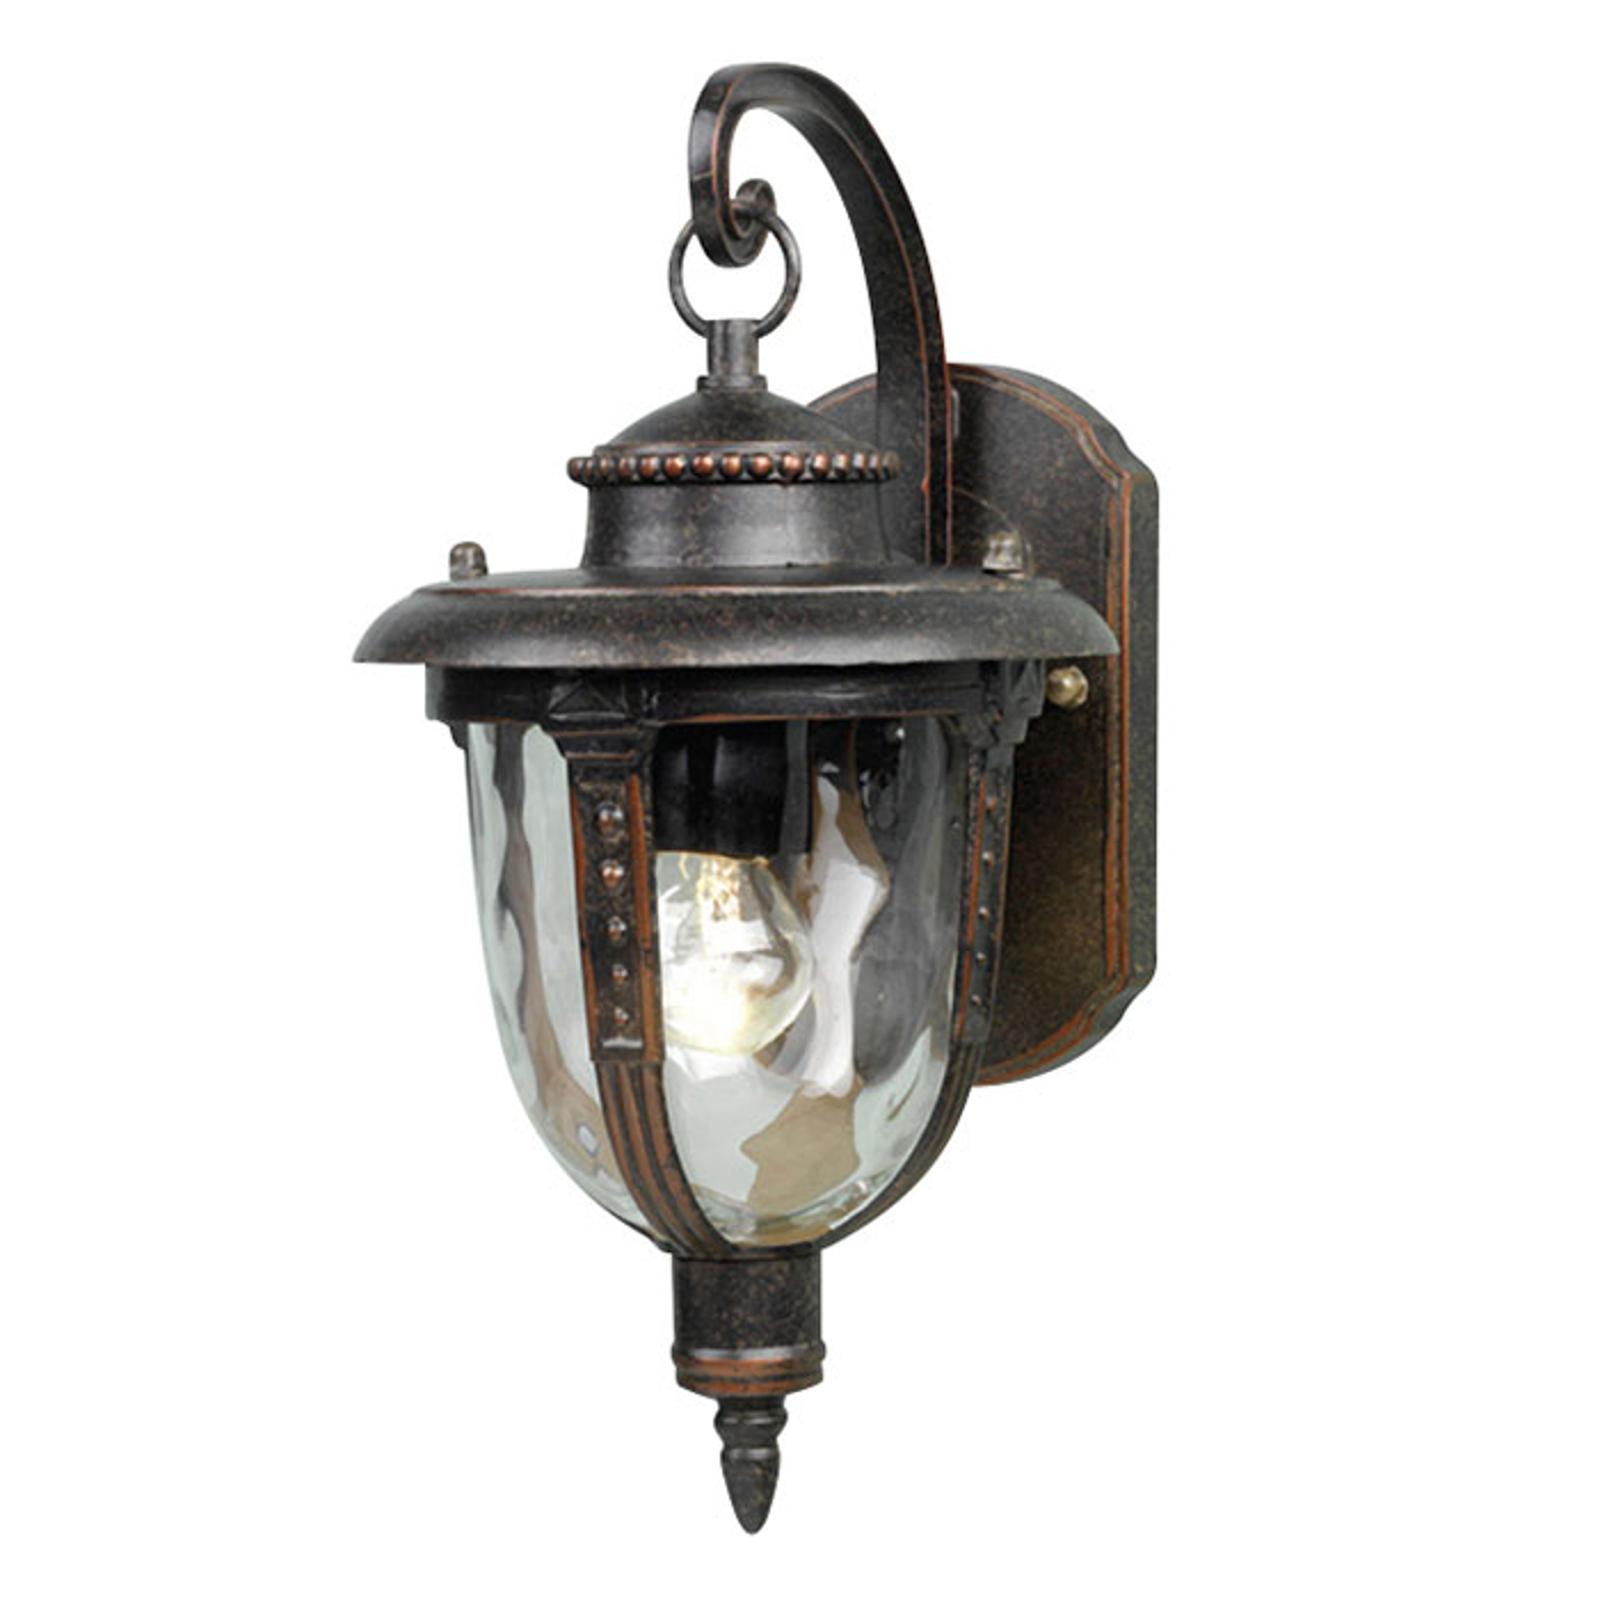 Buitenwandlamp St. Louis S, 32,5 cm hoog